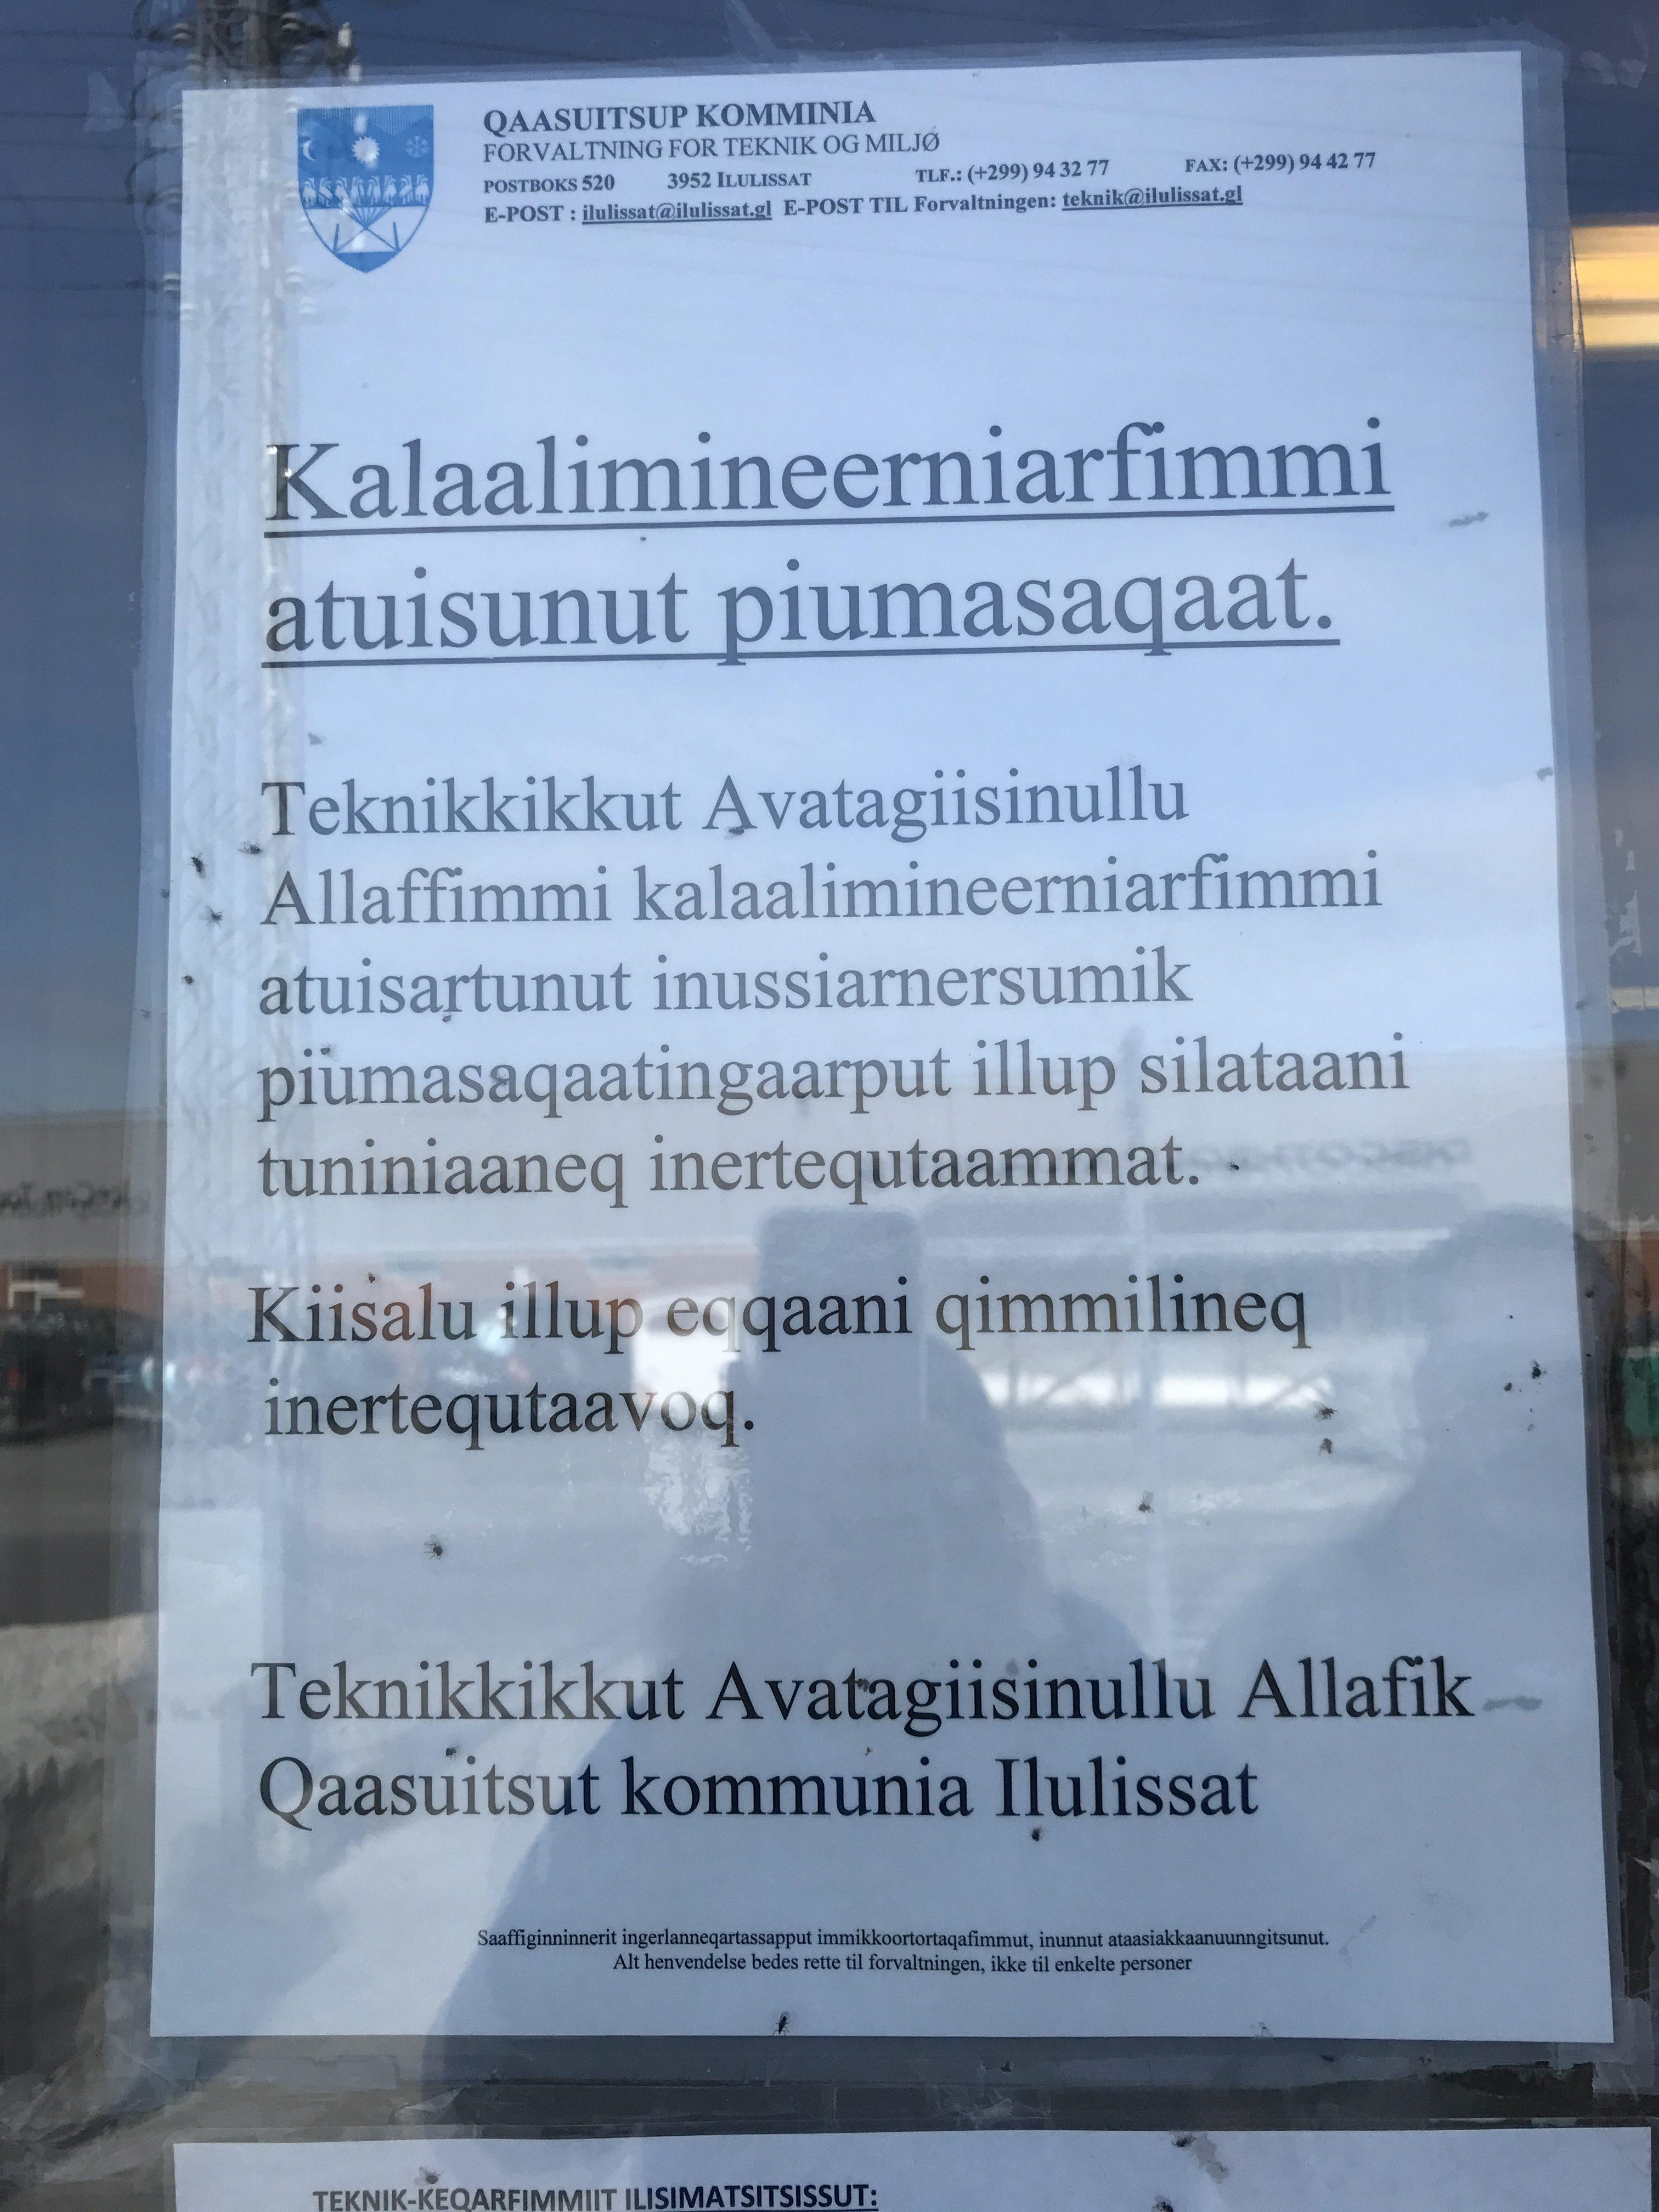 Greenlandish